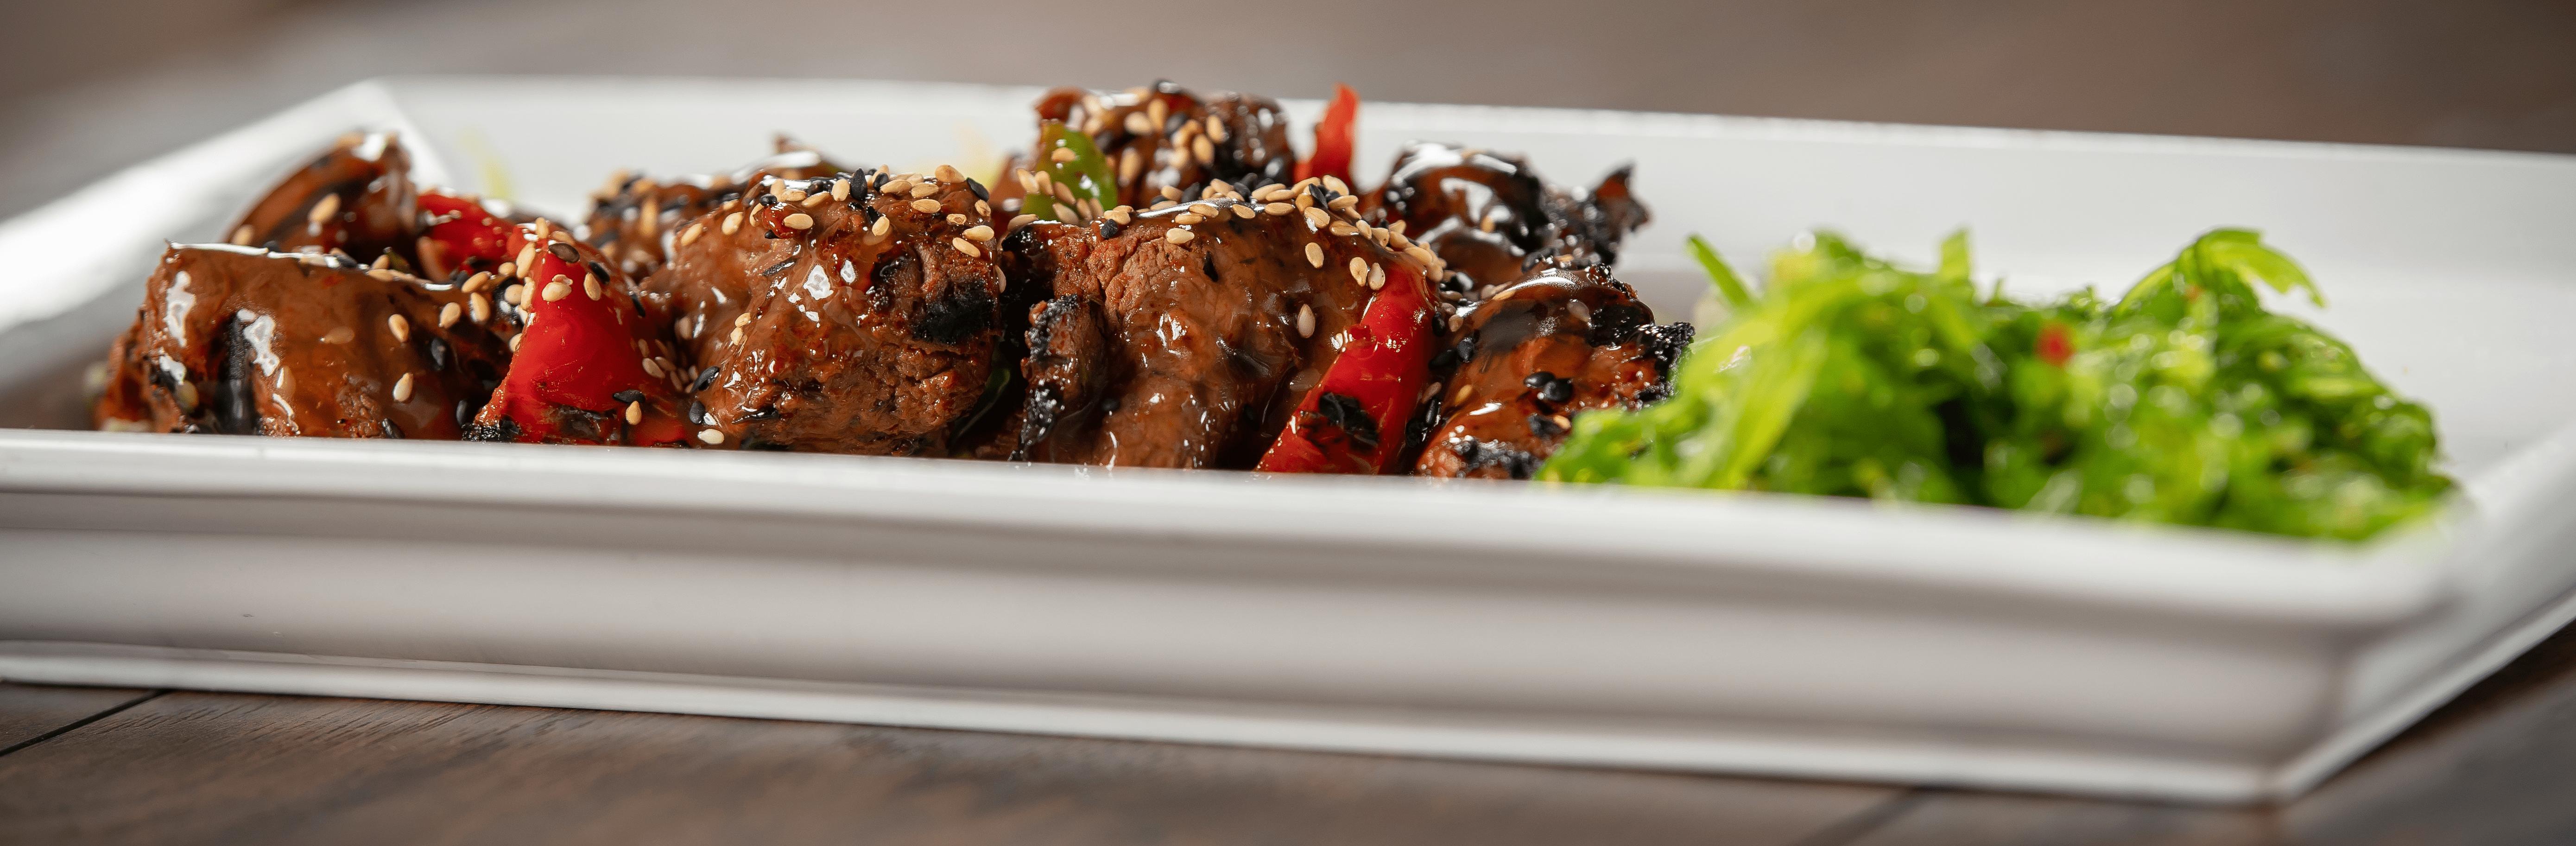 Grilled Kimchee Beef Tenderloin tips